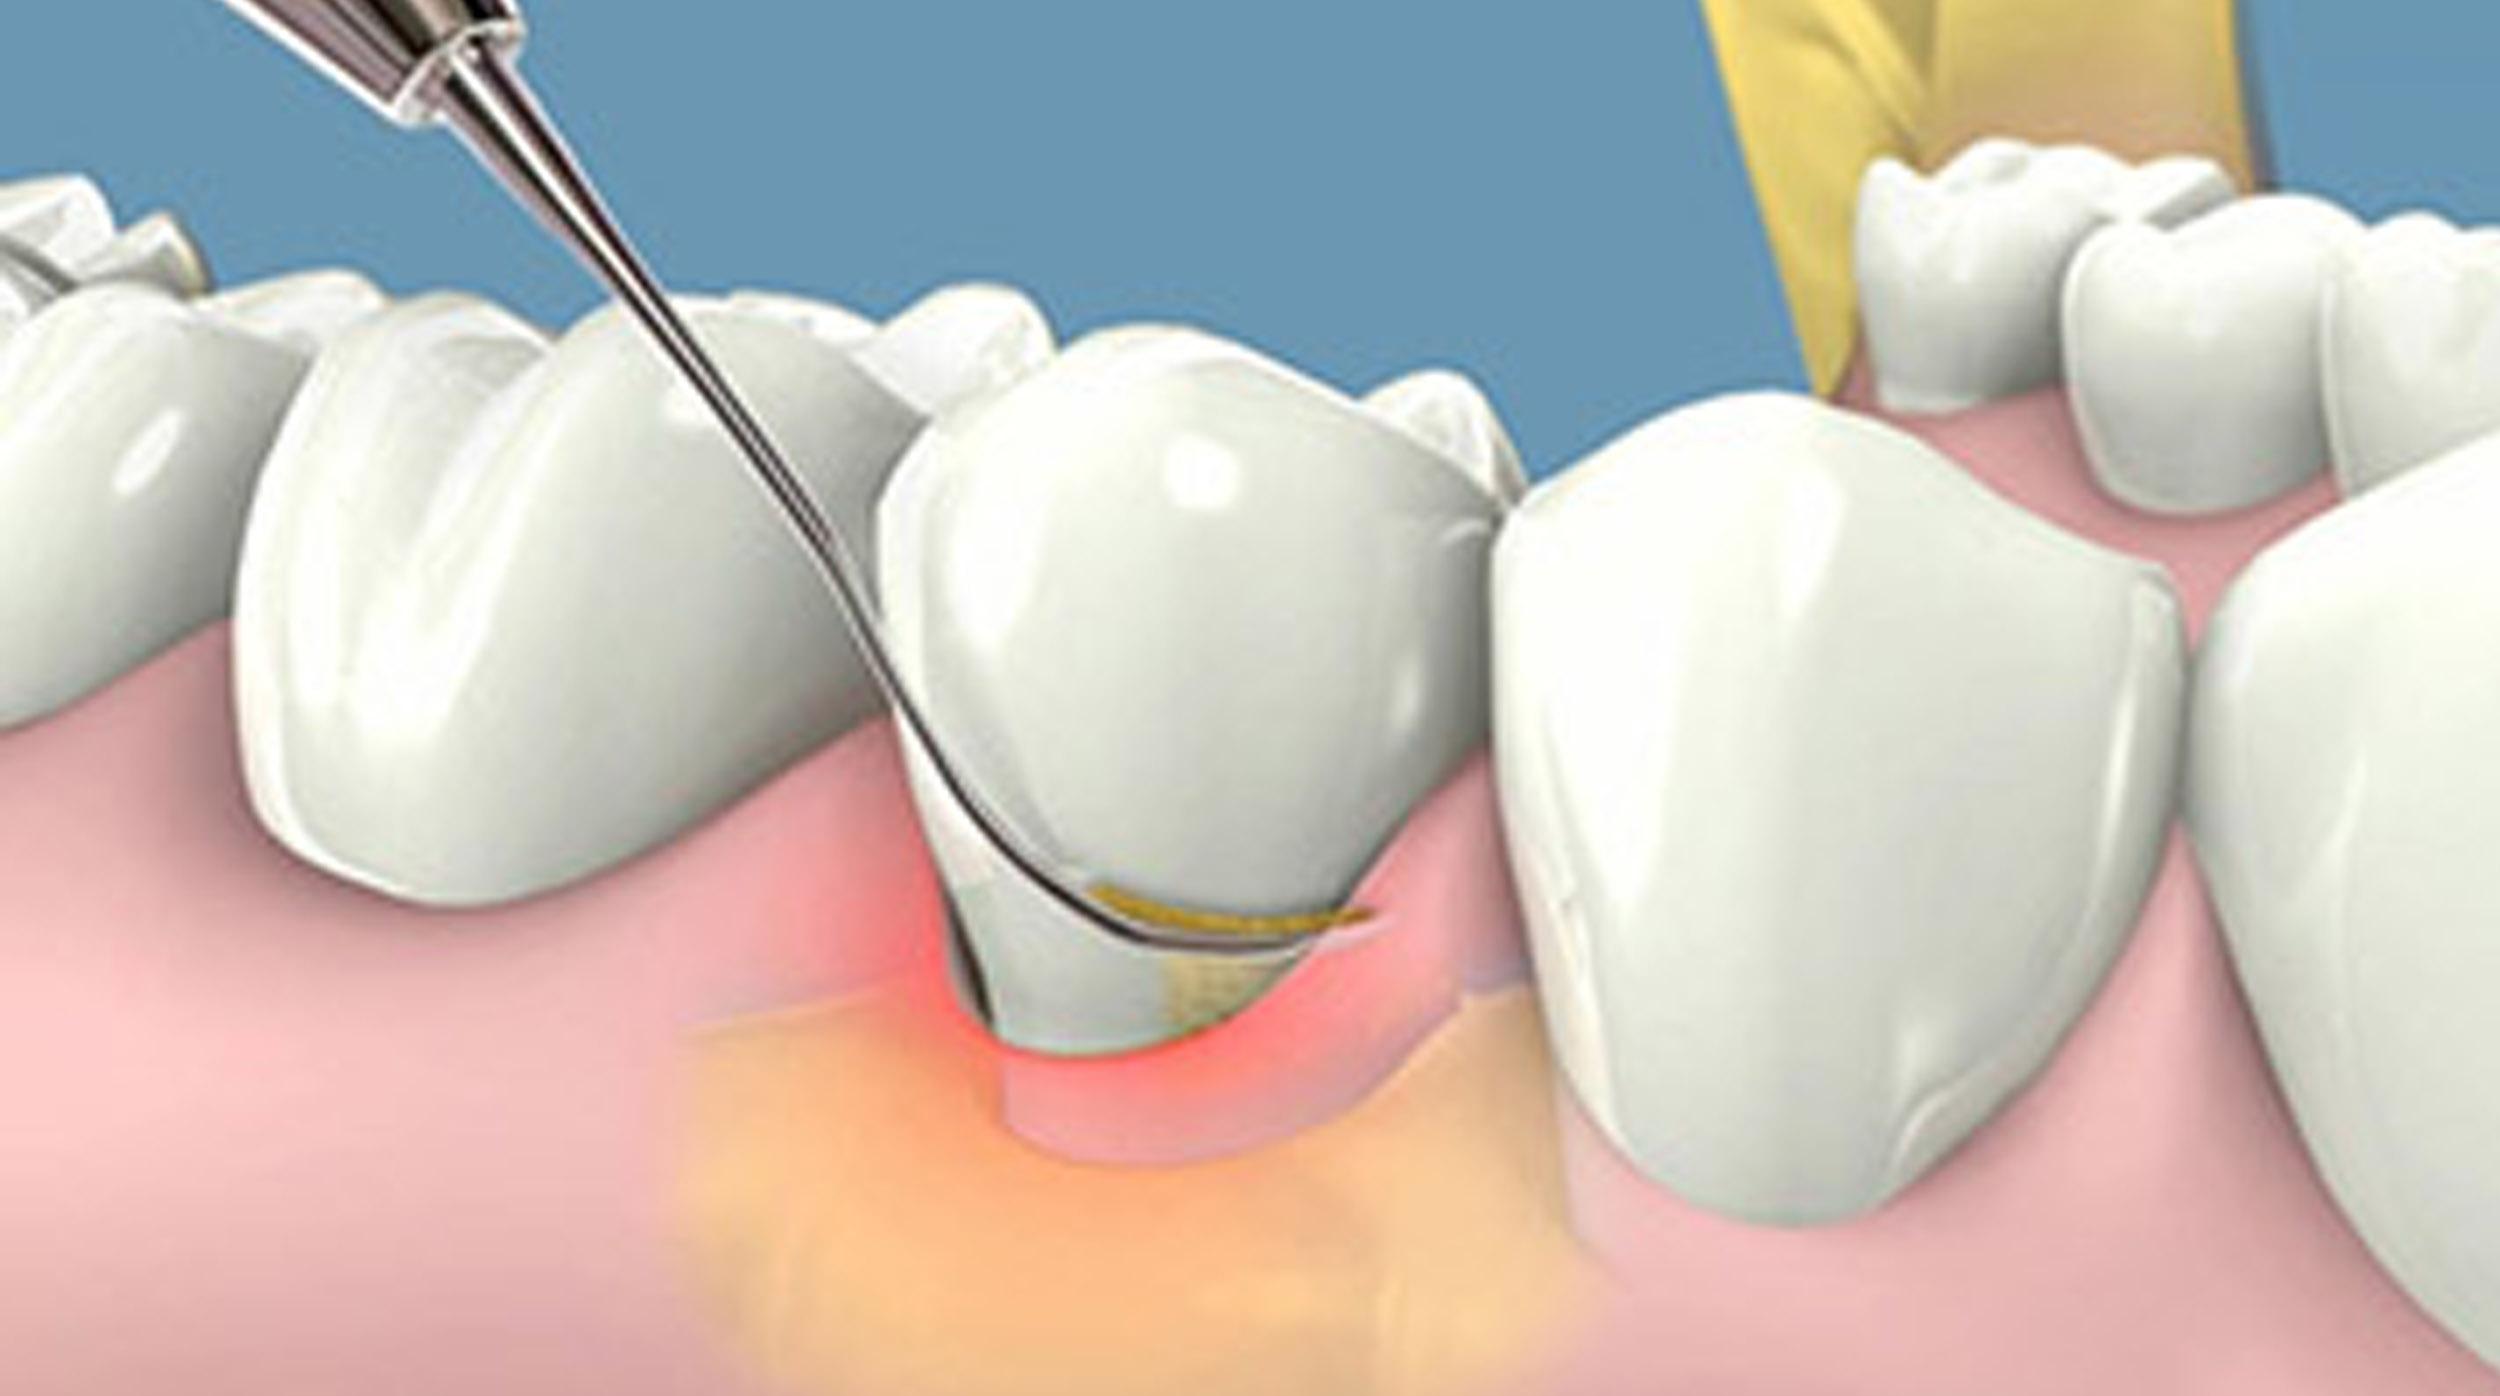 Lấy cao răng lâu năm